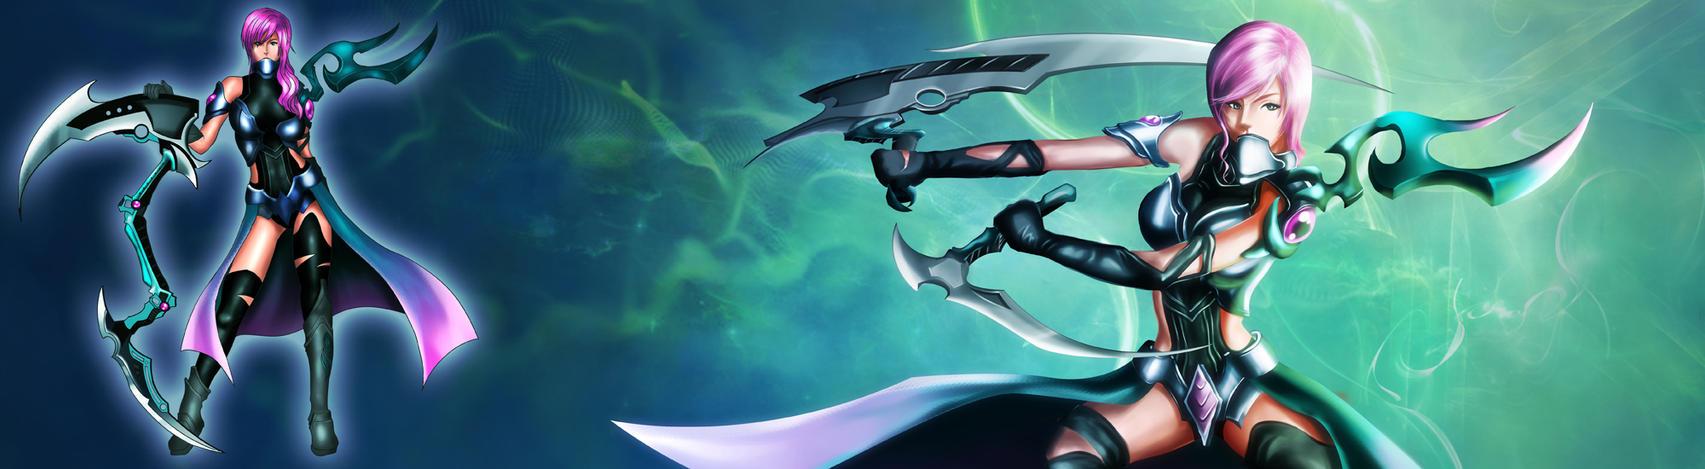 FFXIII - Lightning Returns // Evil Angel by Azaggon